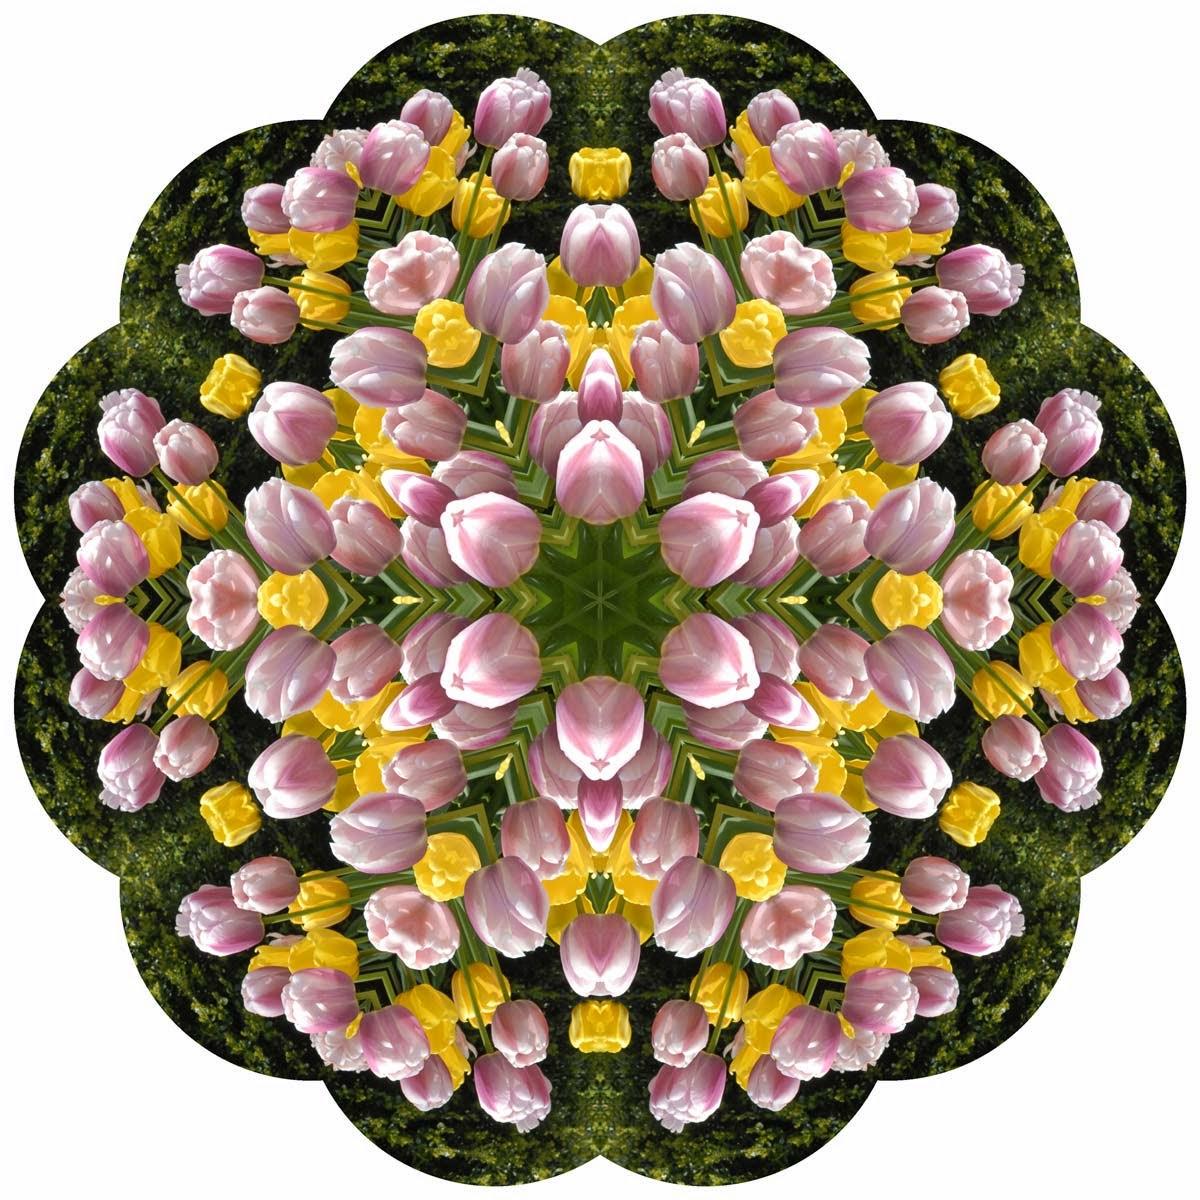 Kaleidoscope Photo Art Tulips by Jeanne Selep